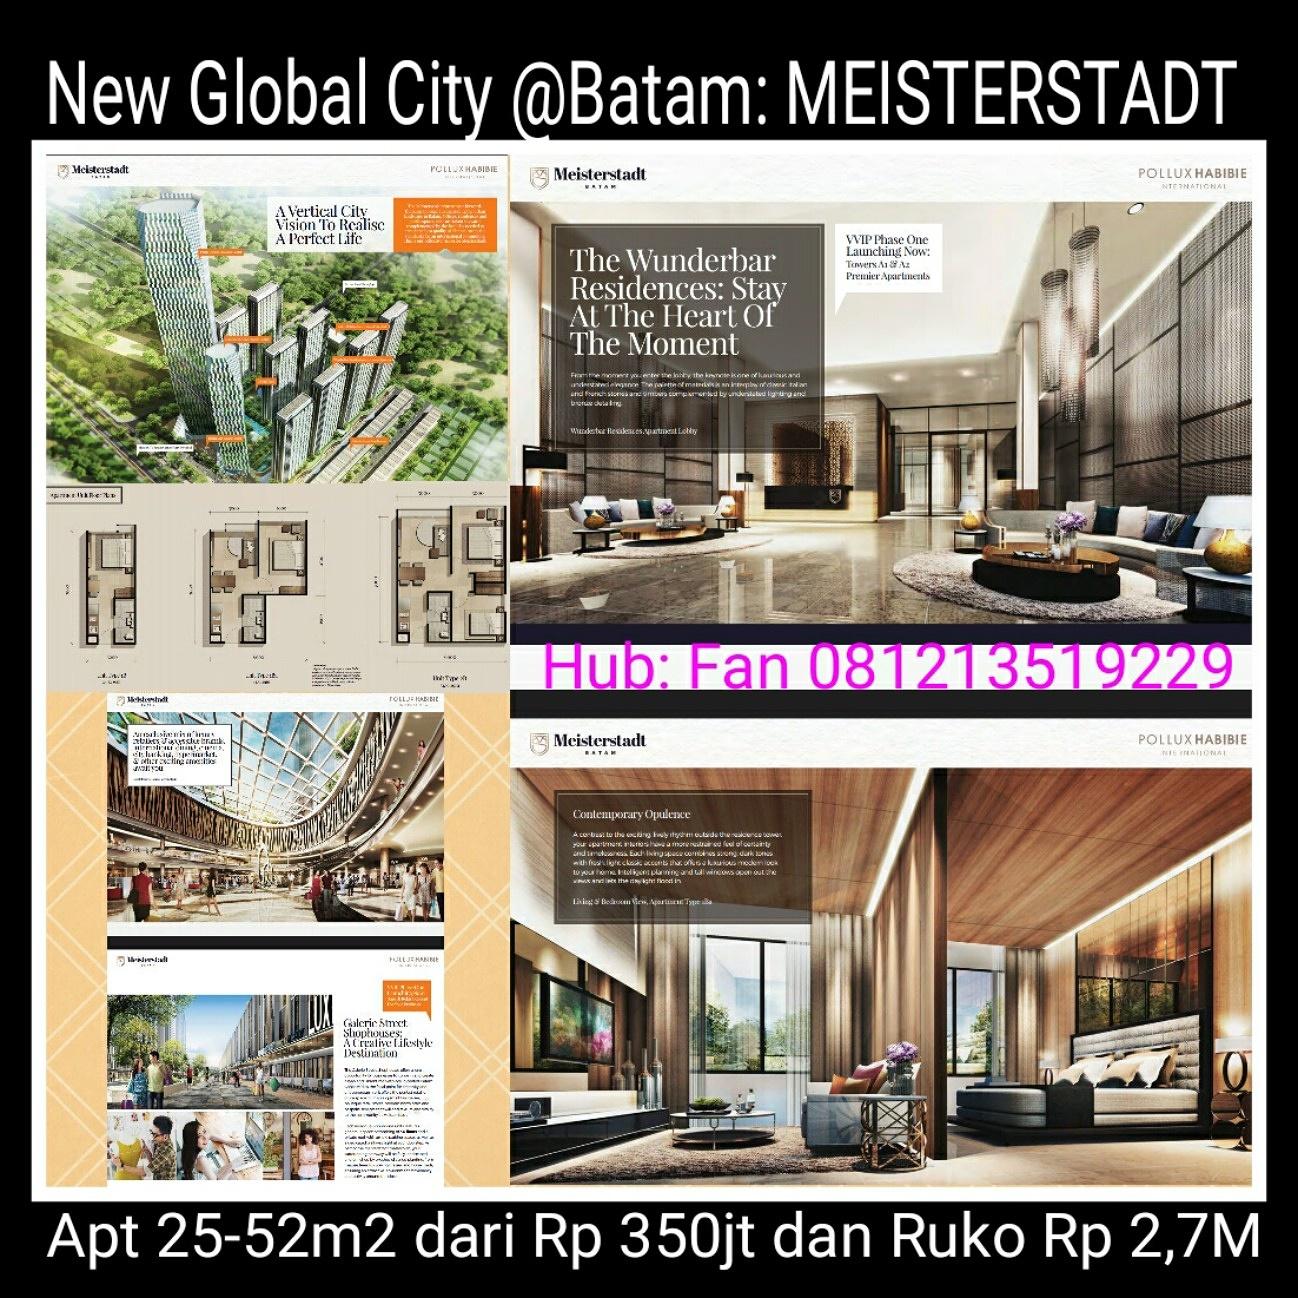 Apartment Meisterstadt Batam.jpg